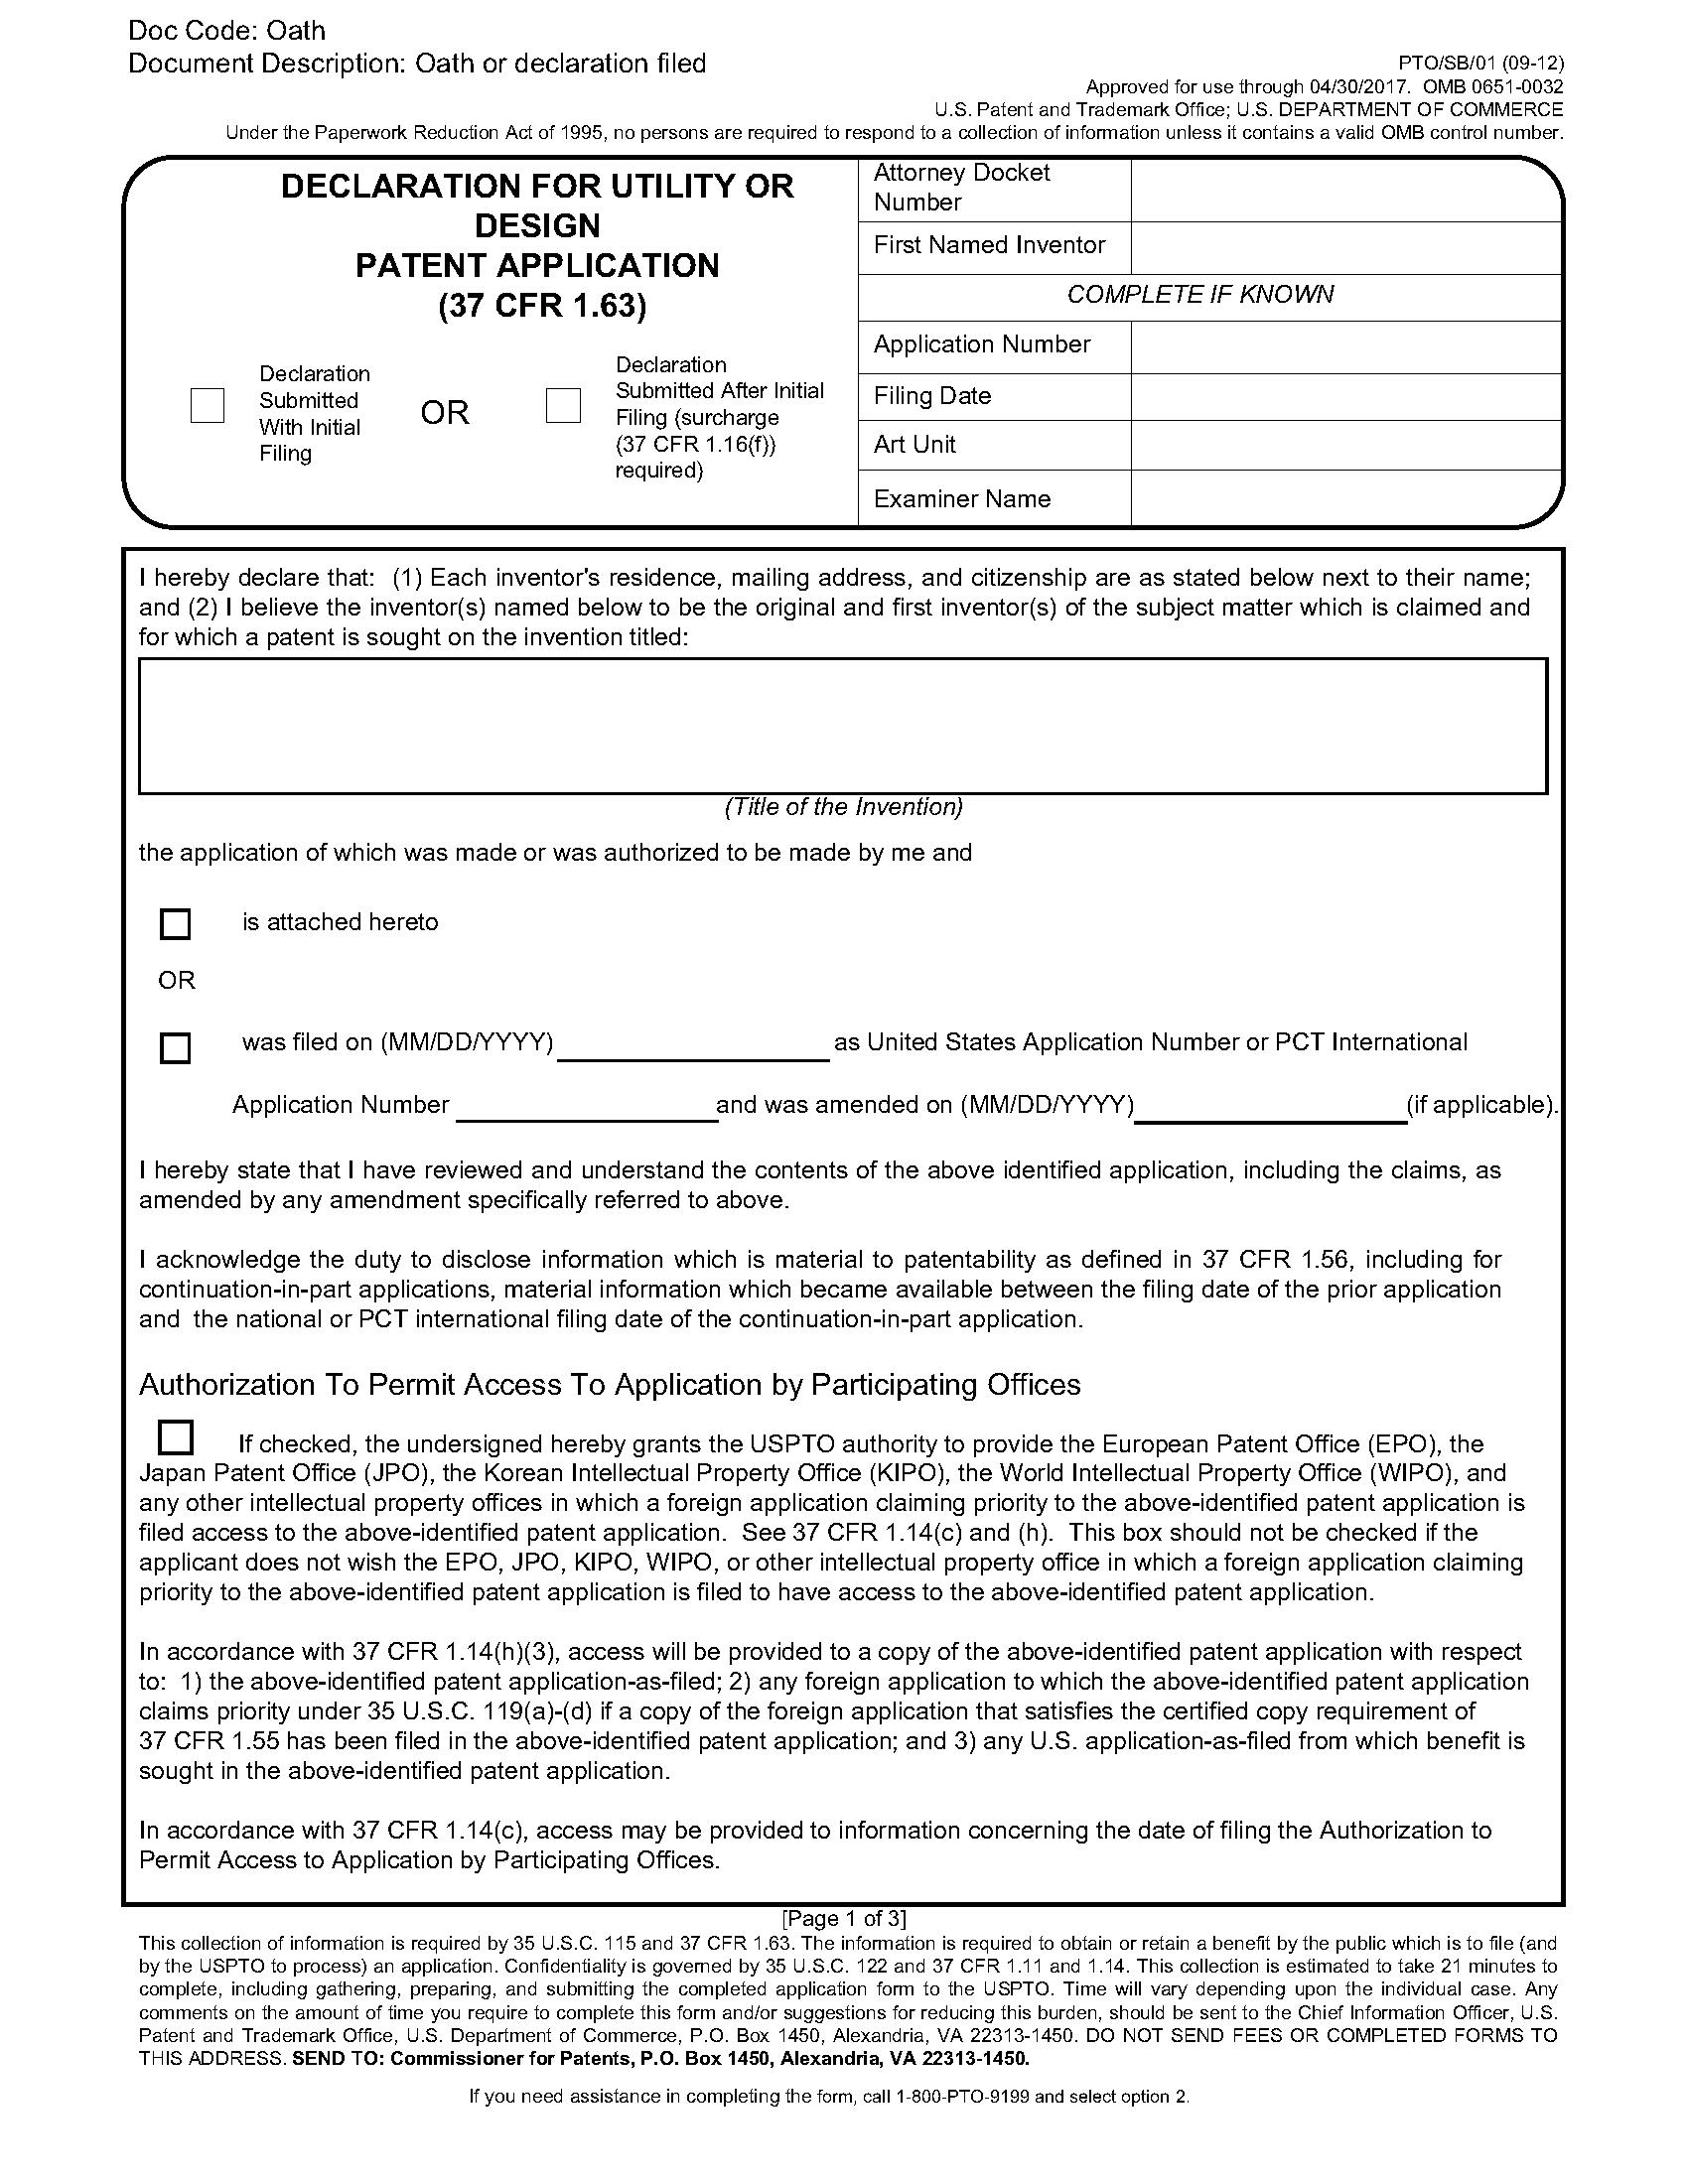 Declaration For Utility Or Design Patent Application - (37 Cfr 1.63)